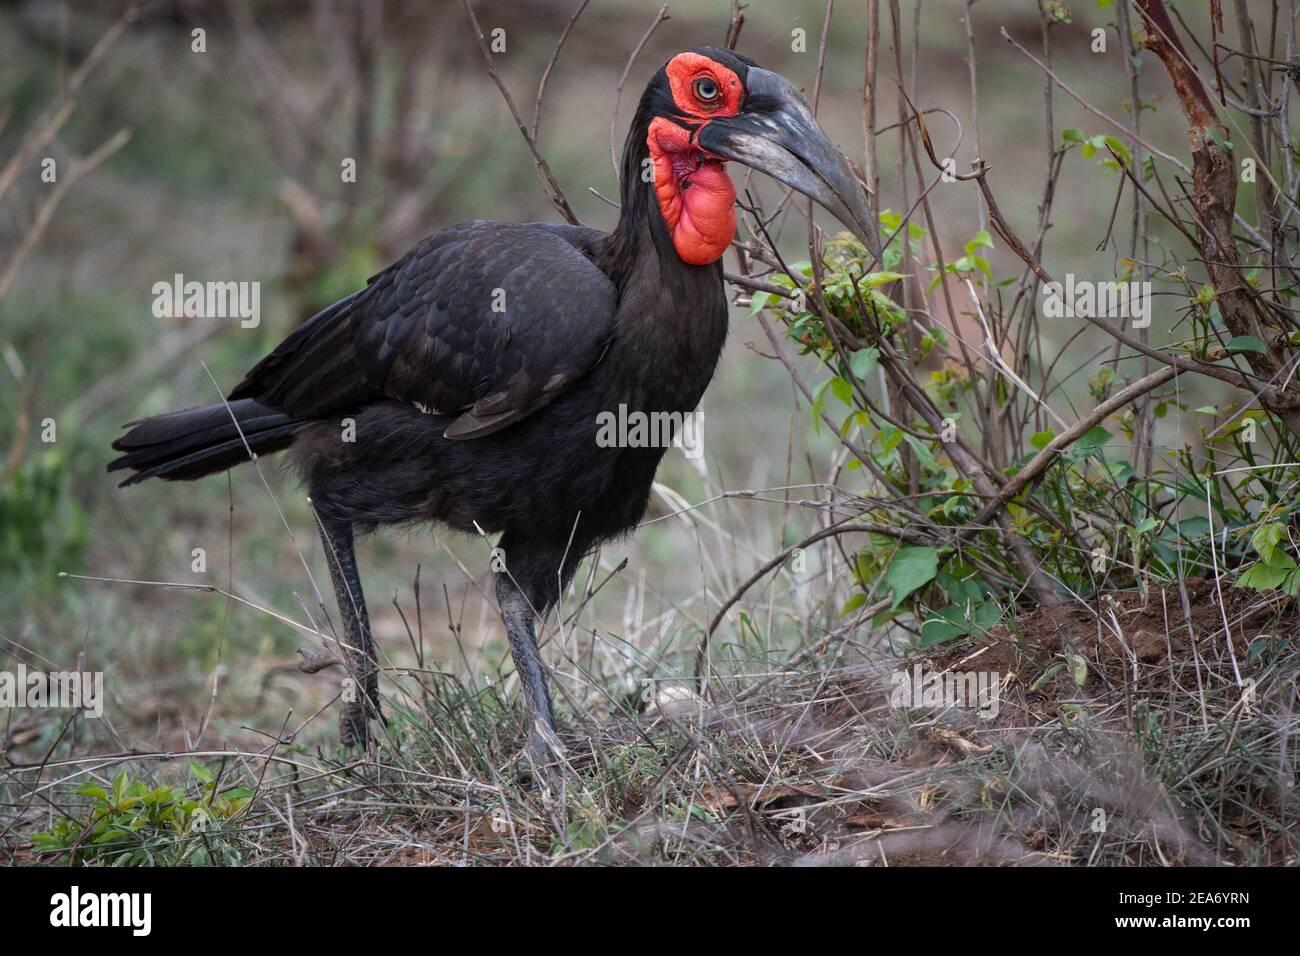 Southern ground hornbill, Bucorvus leadbeateri, Kruger National Park, South Africa Stock Photo